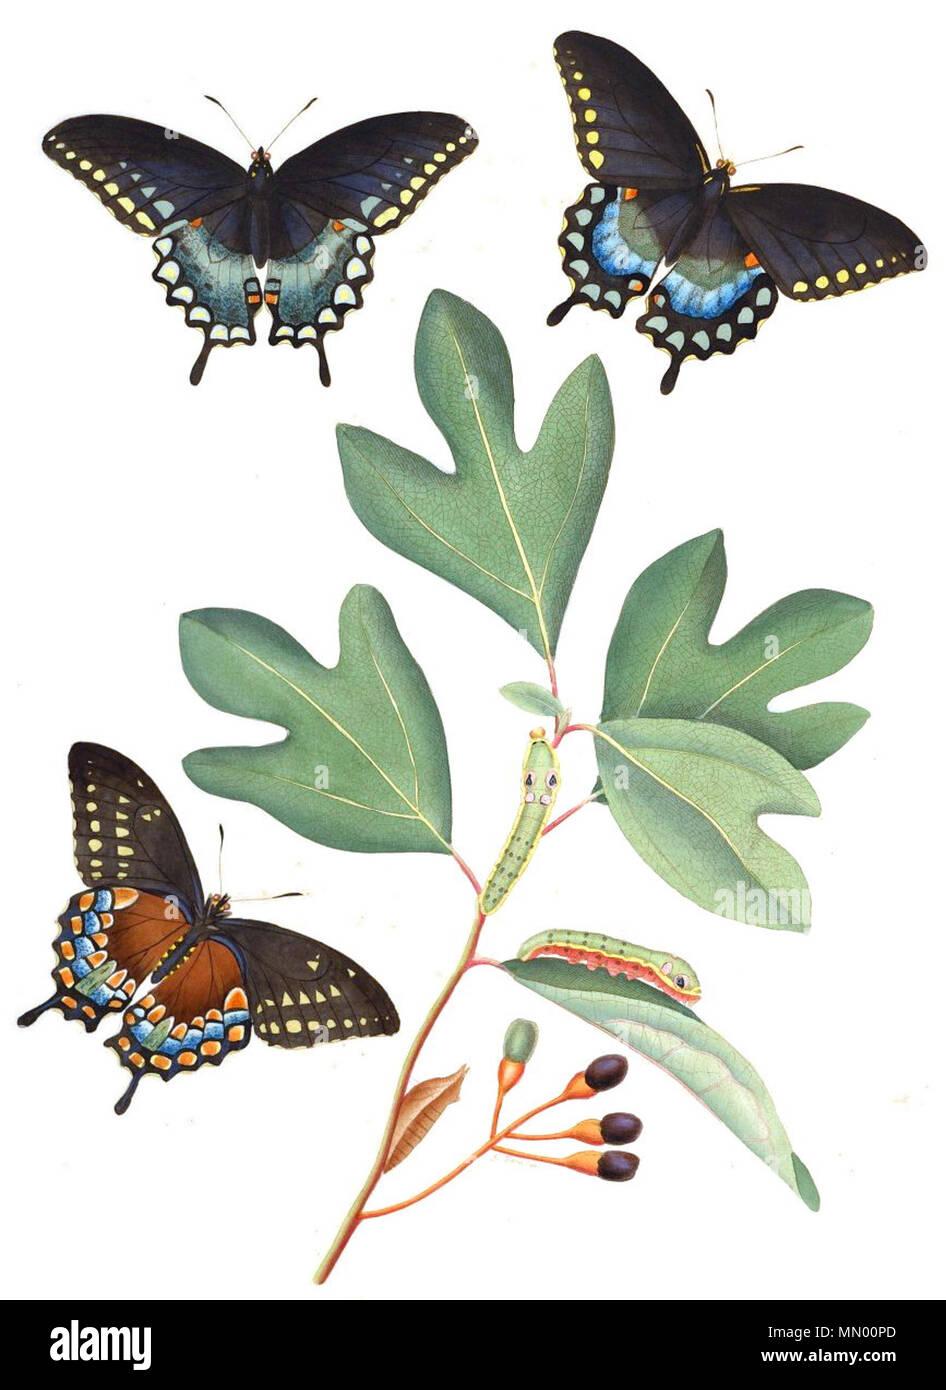 . Especie Spicebush , Papilio Troilo, el Sasafrás, Sassafras albidum (hostplant), grabado pintado a mano . 1797. Smith, James Edward, Sir, 1759-1828 (texto), abad, JUAN (1751-1840) artista AbbotV1Tab02A Foto de stock